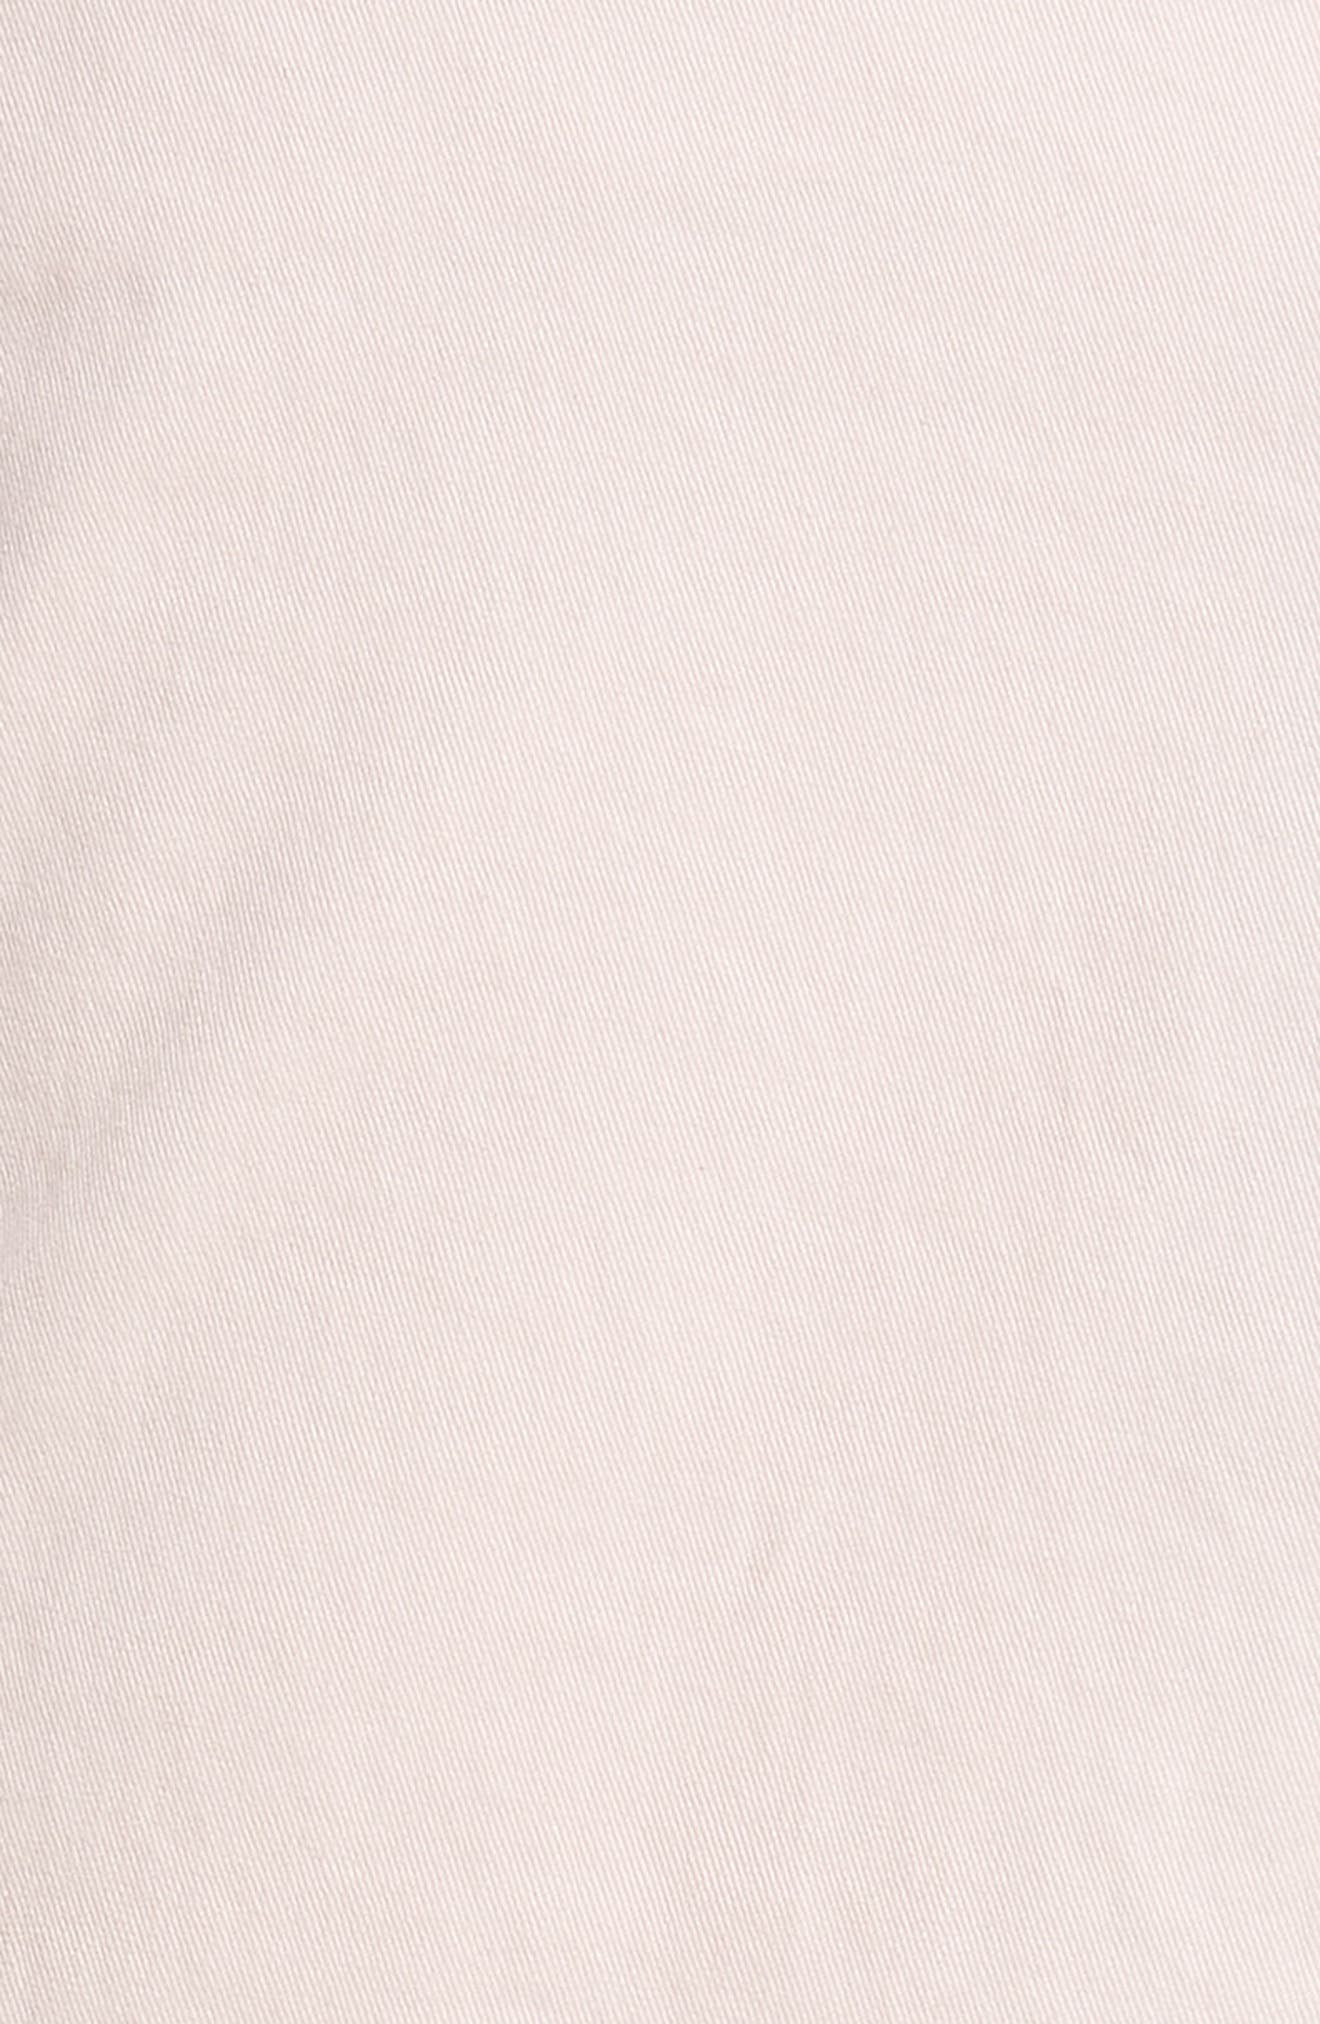 Ballard Slim Fit Stretch Chino 11-Inch Shorts,                             Alternate thumbnail 75, color,